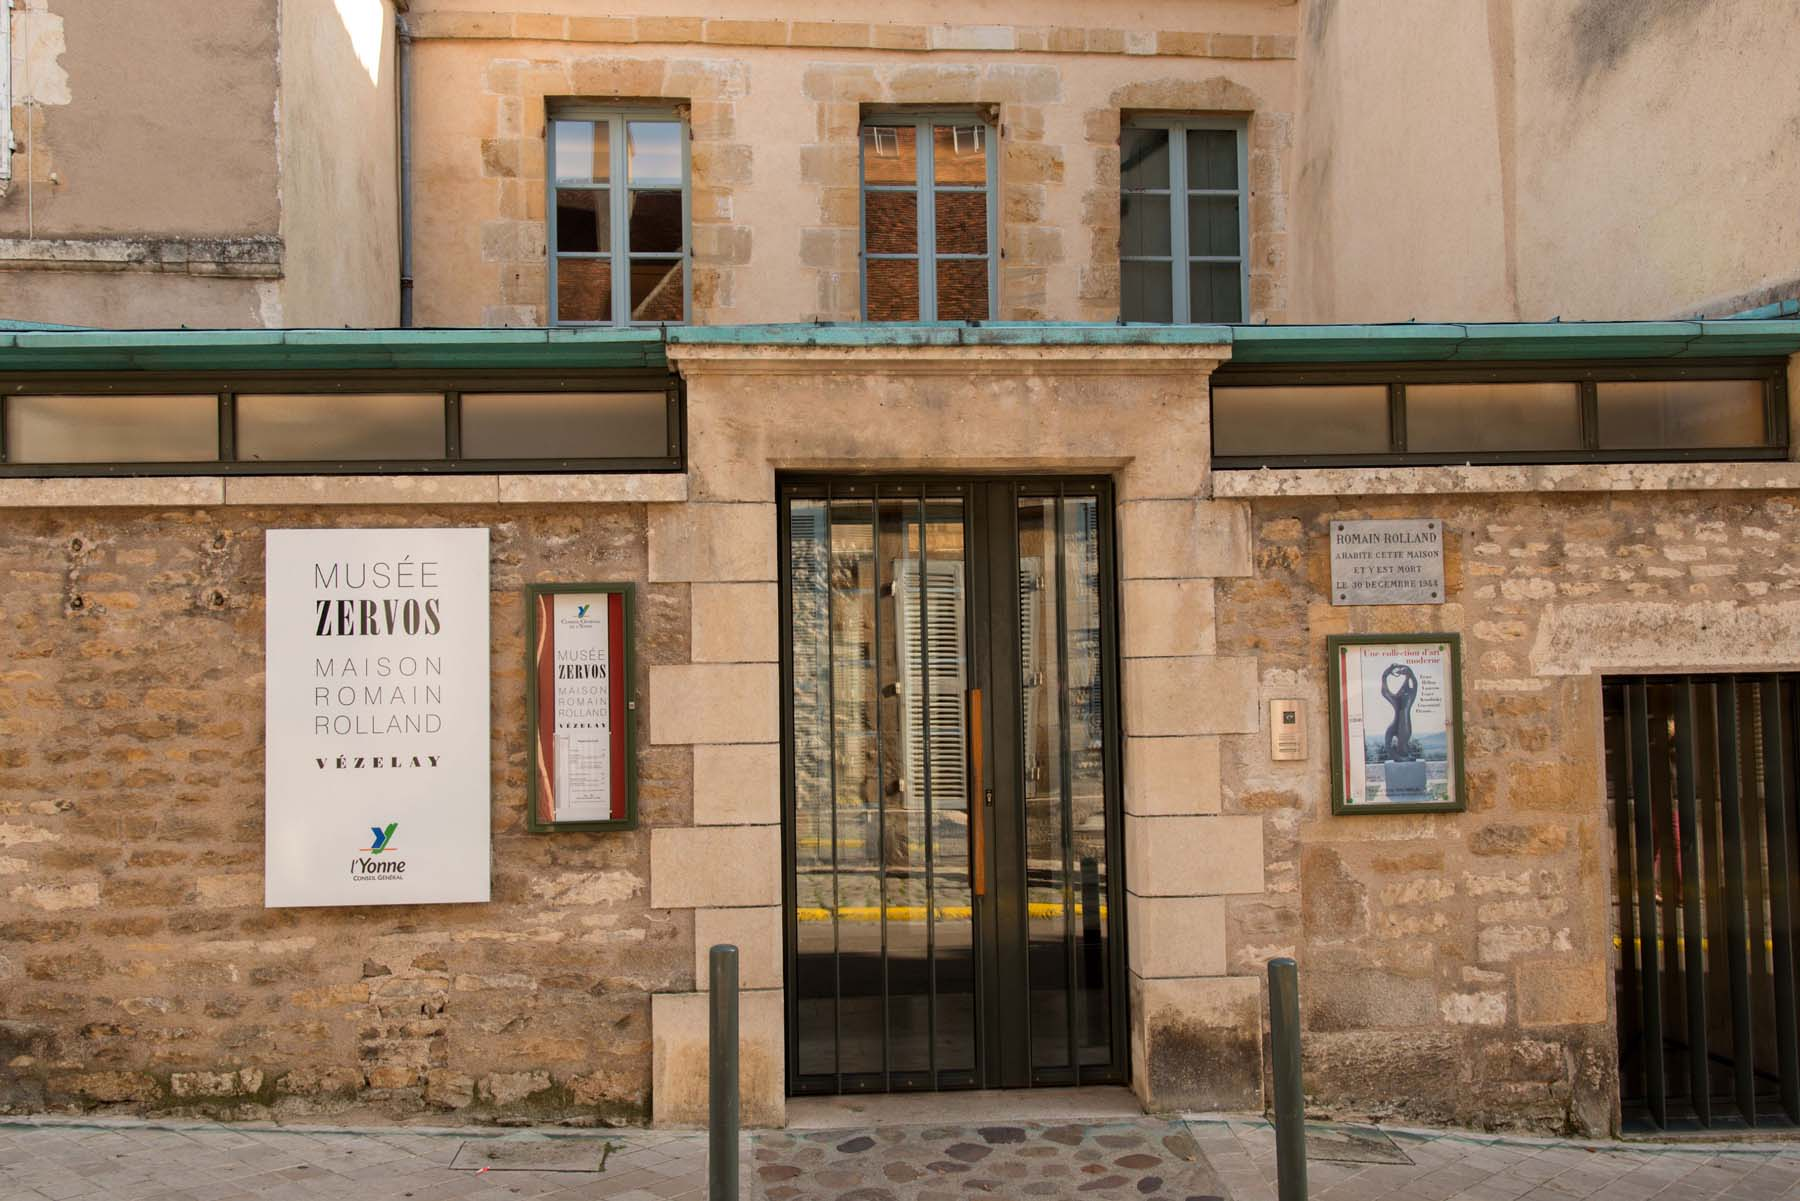 Musée Zervos à Vezelay